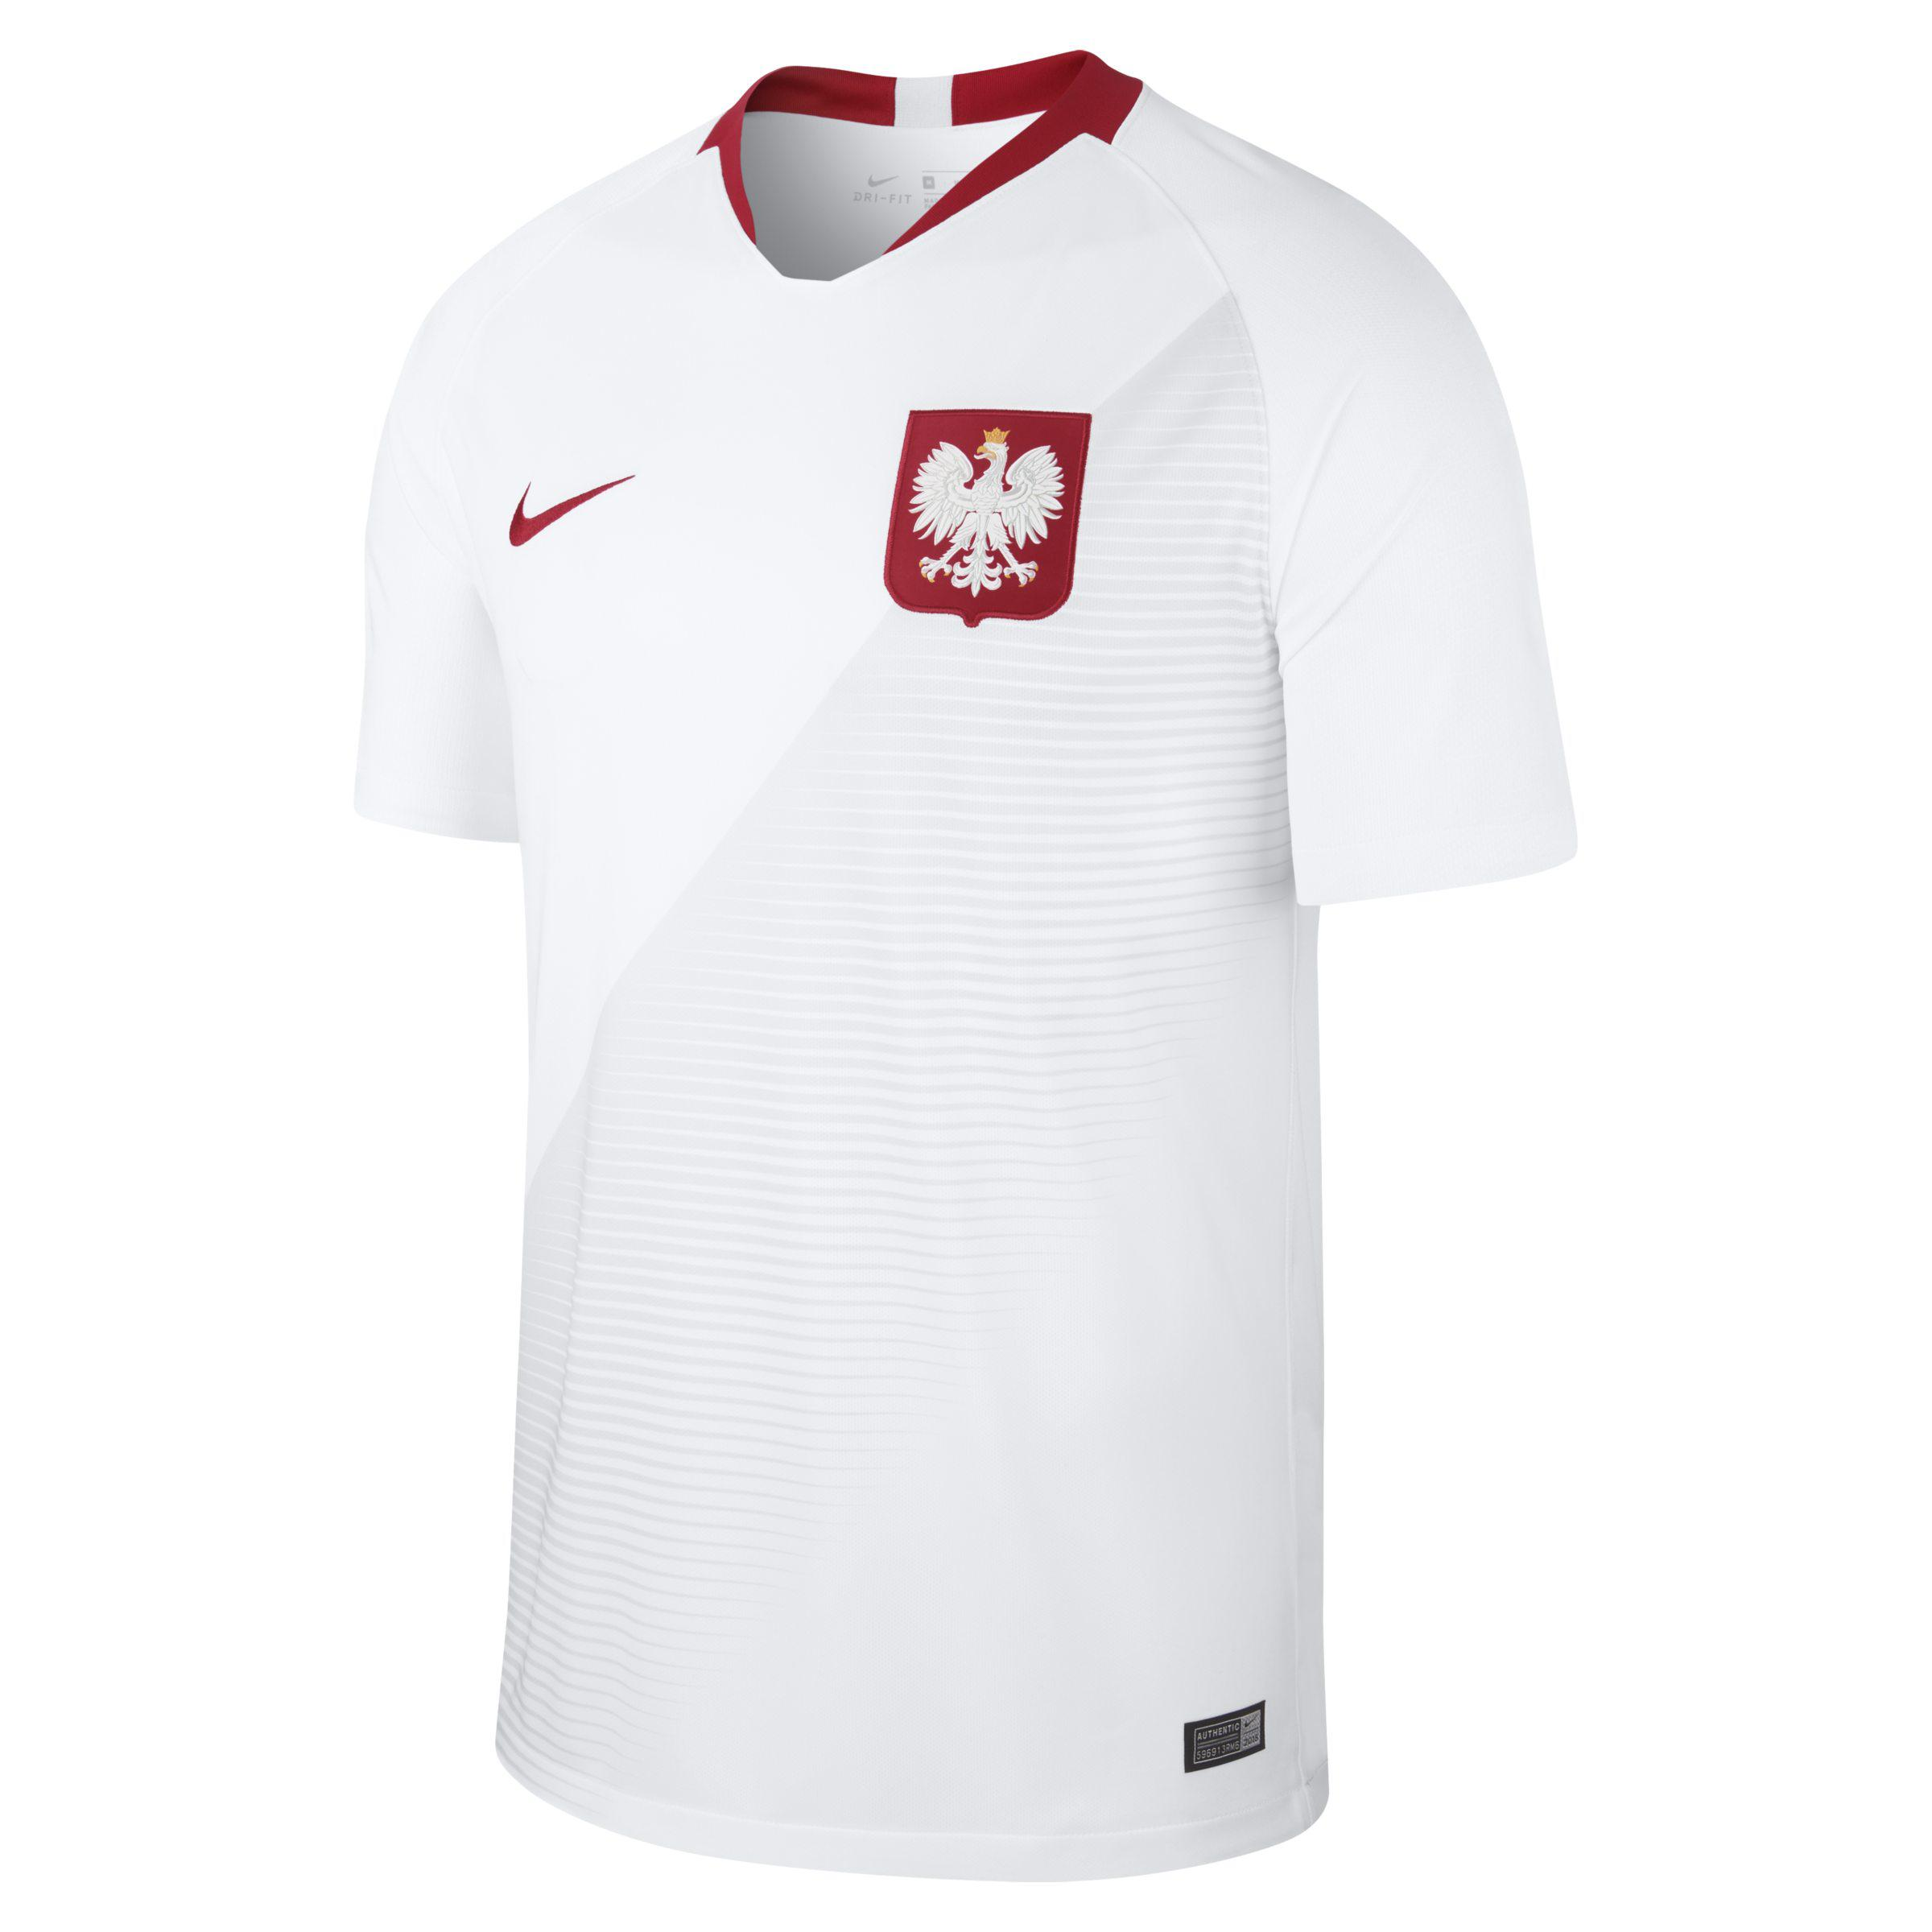 0c6ac506c Nike 2018 Poland Stadium Home Football Shirt in White for Men - Lyst